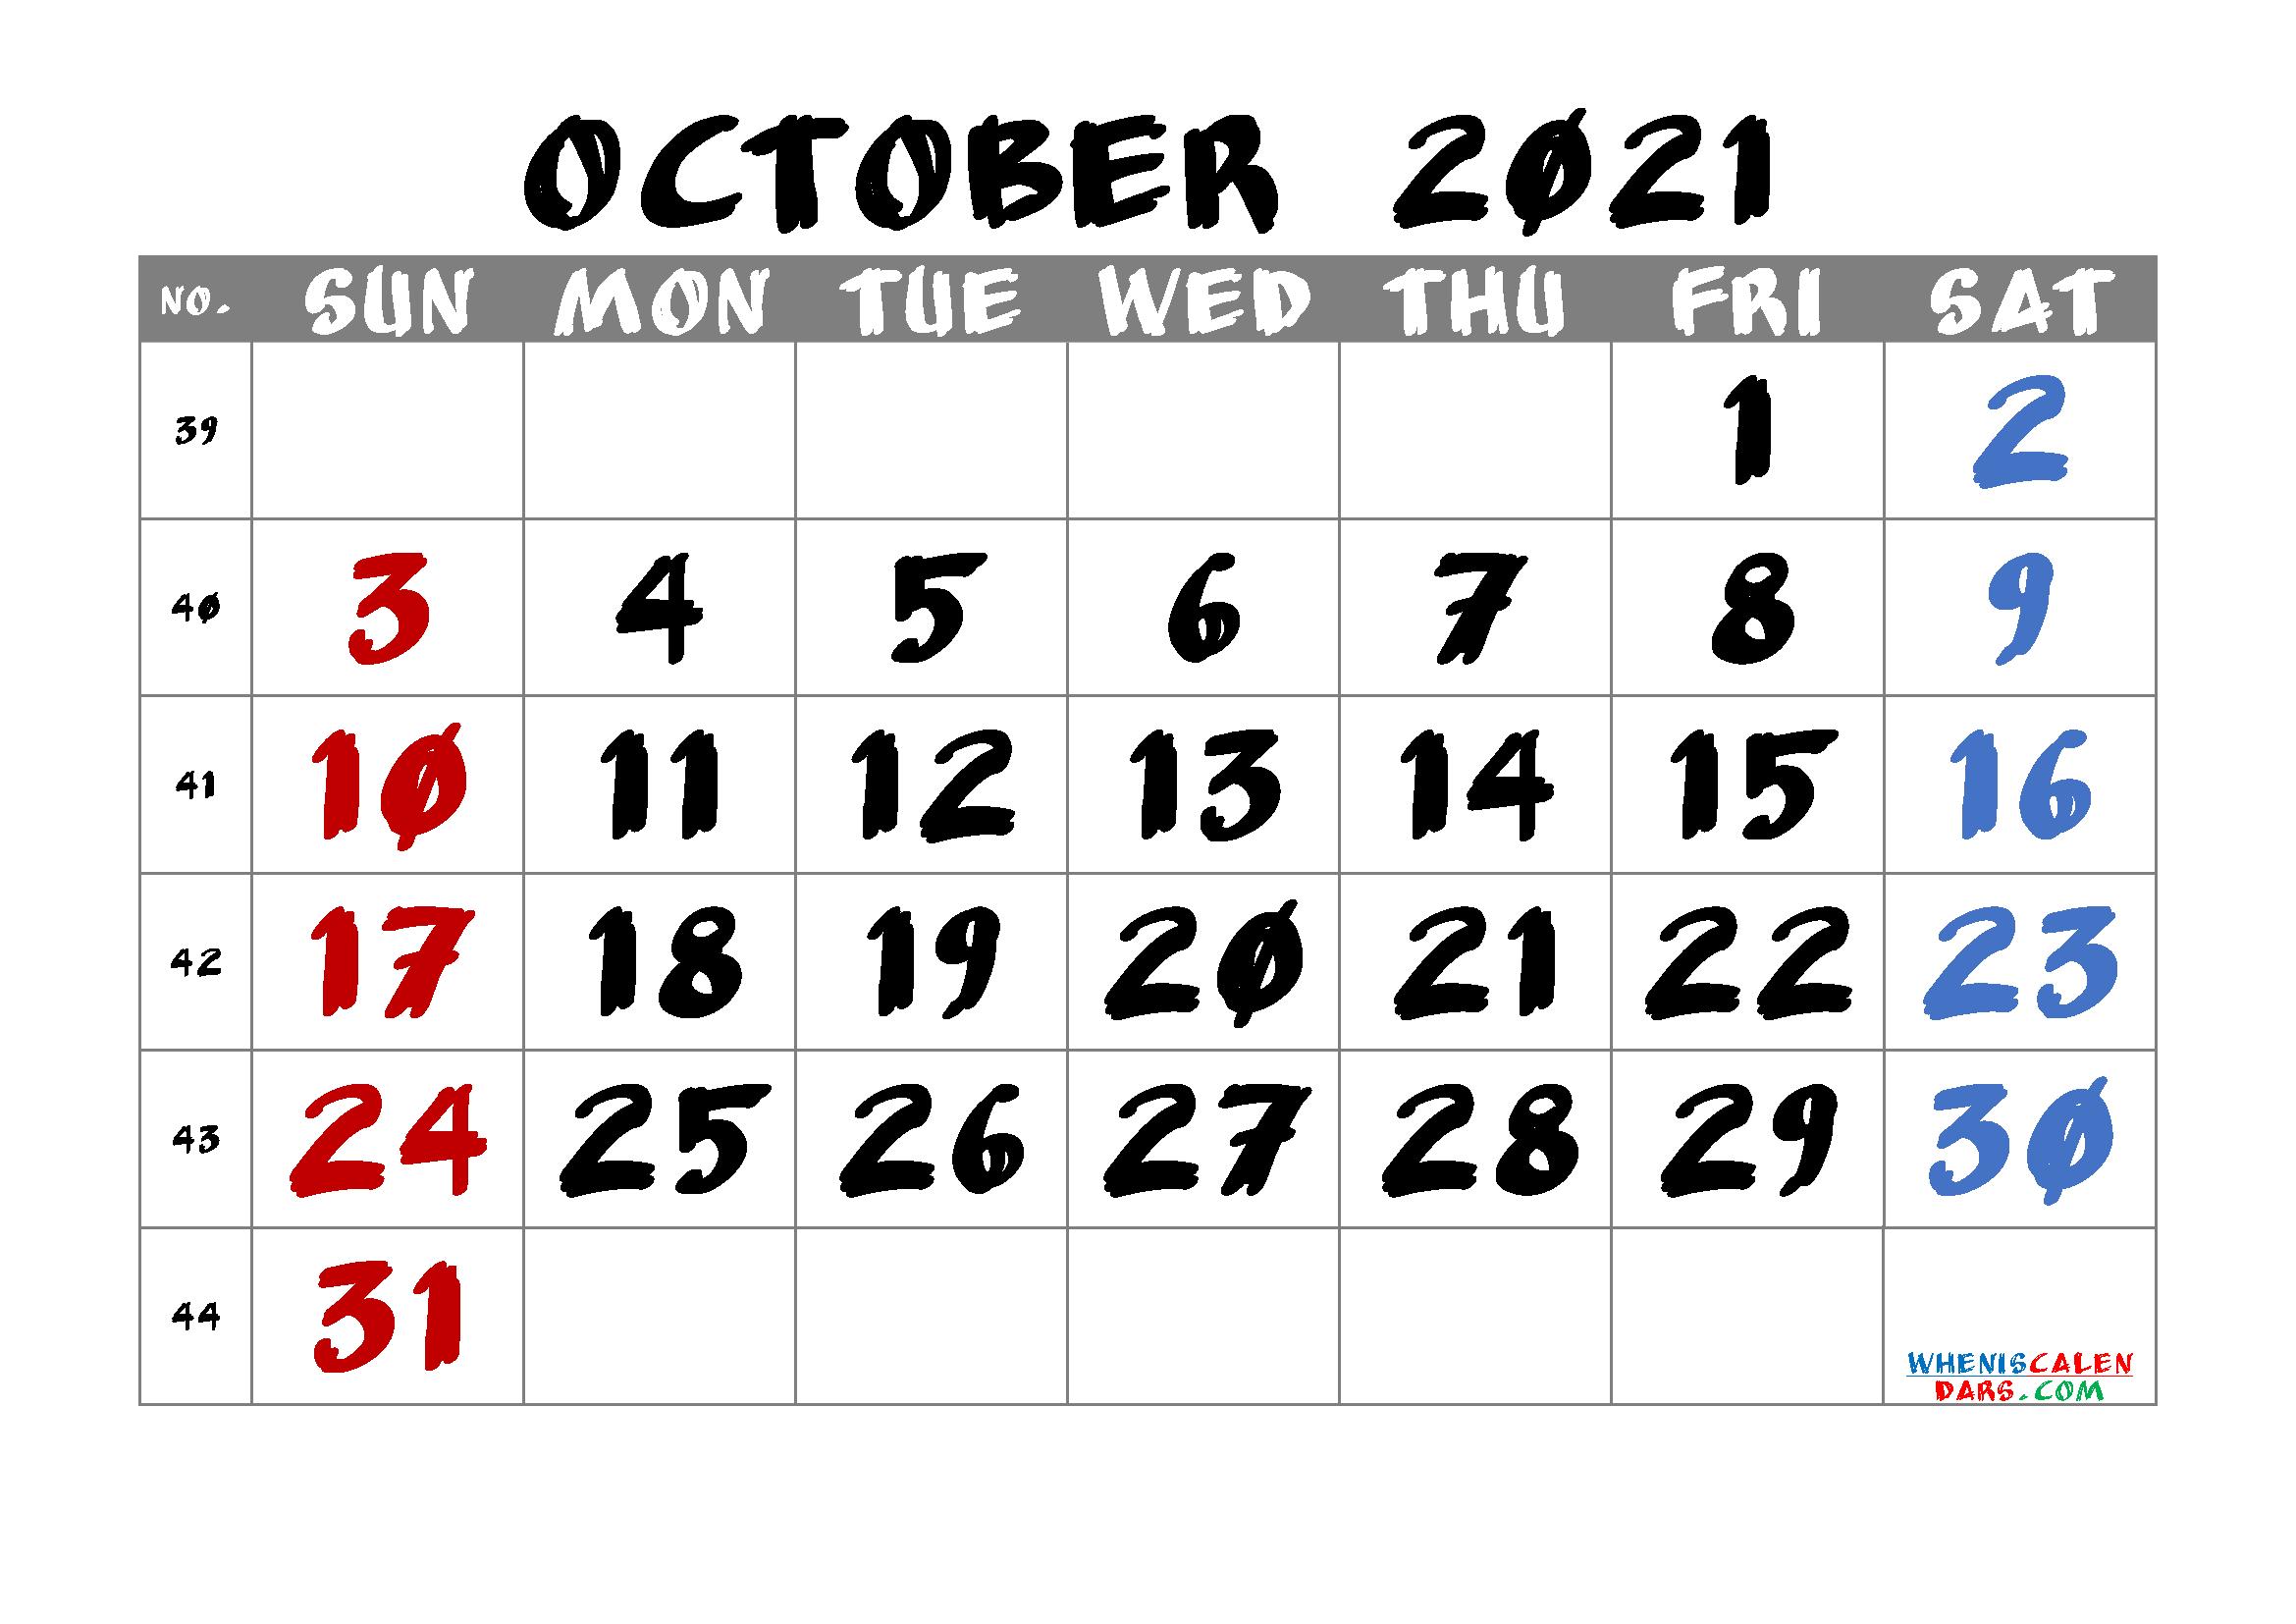 Free Printable October 2021 Calendar with regard to Calendar 2021 October Fill In